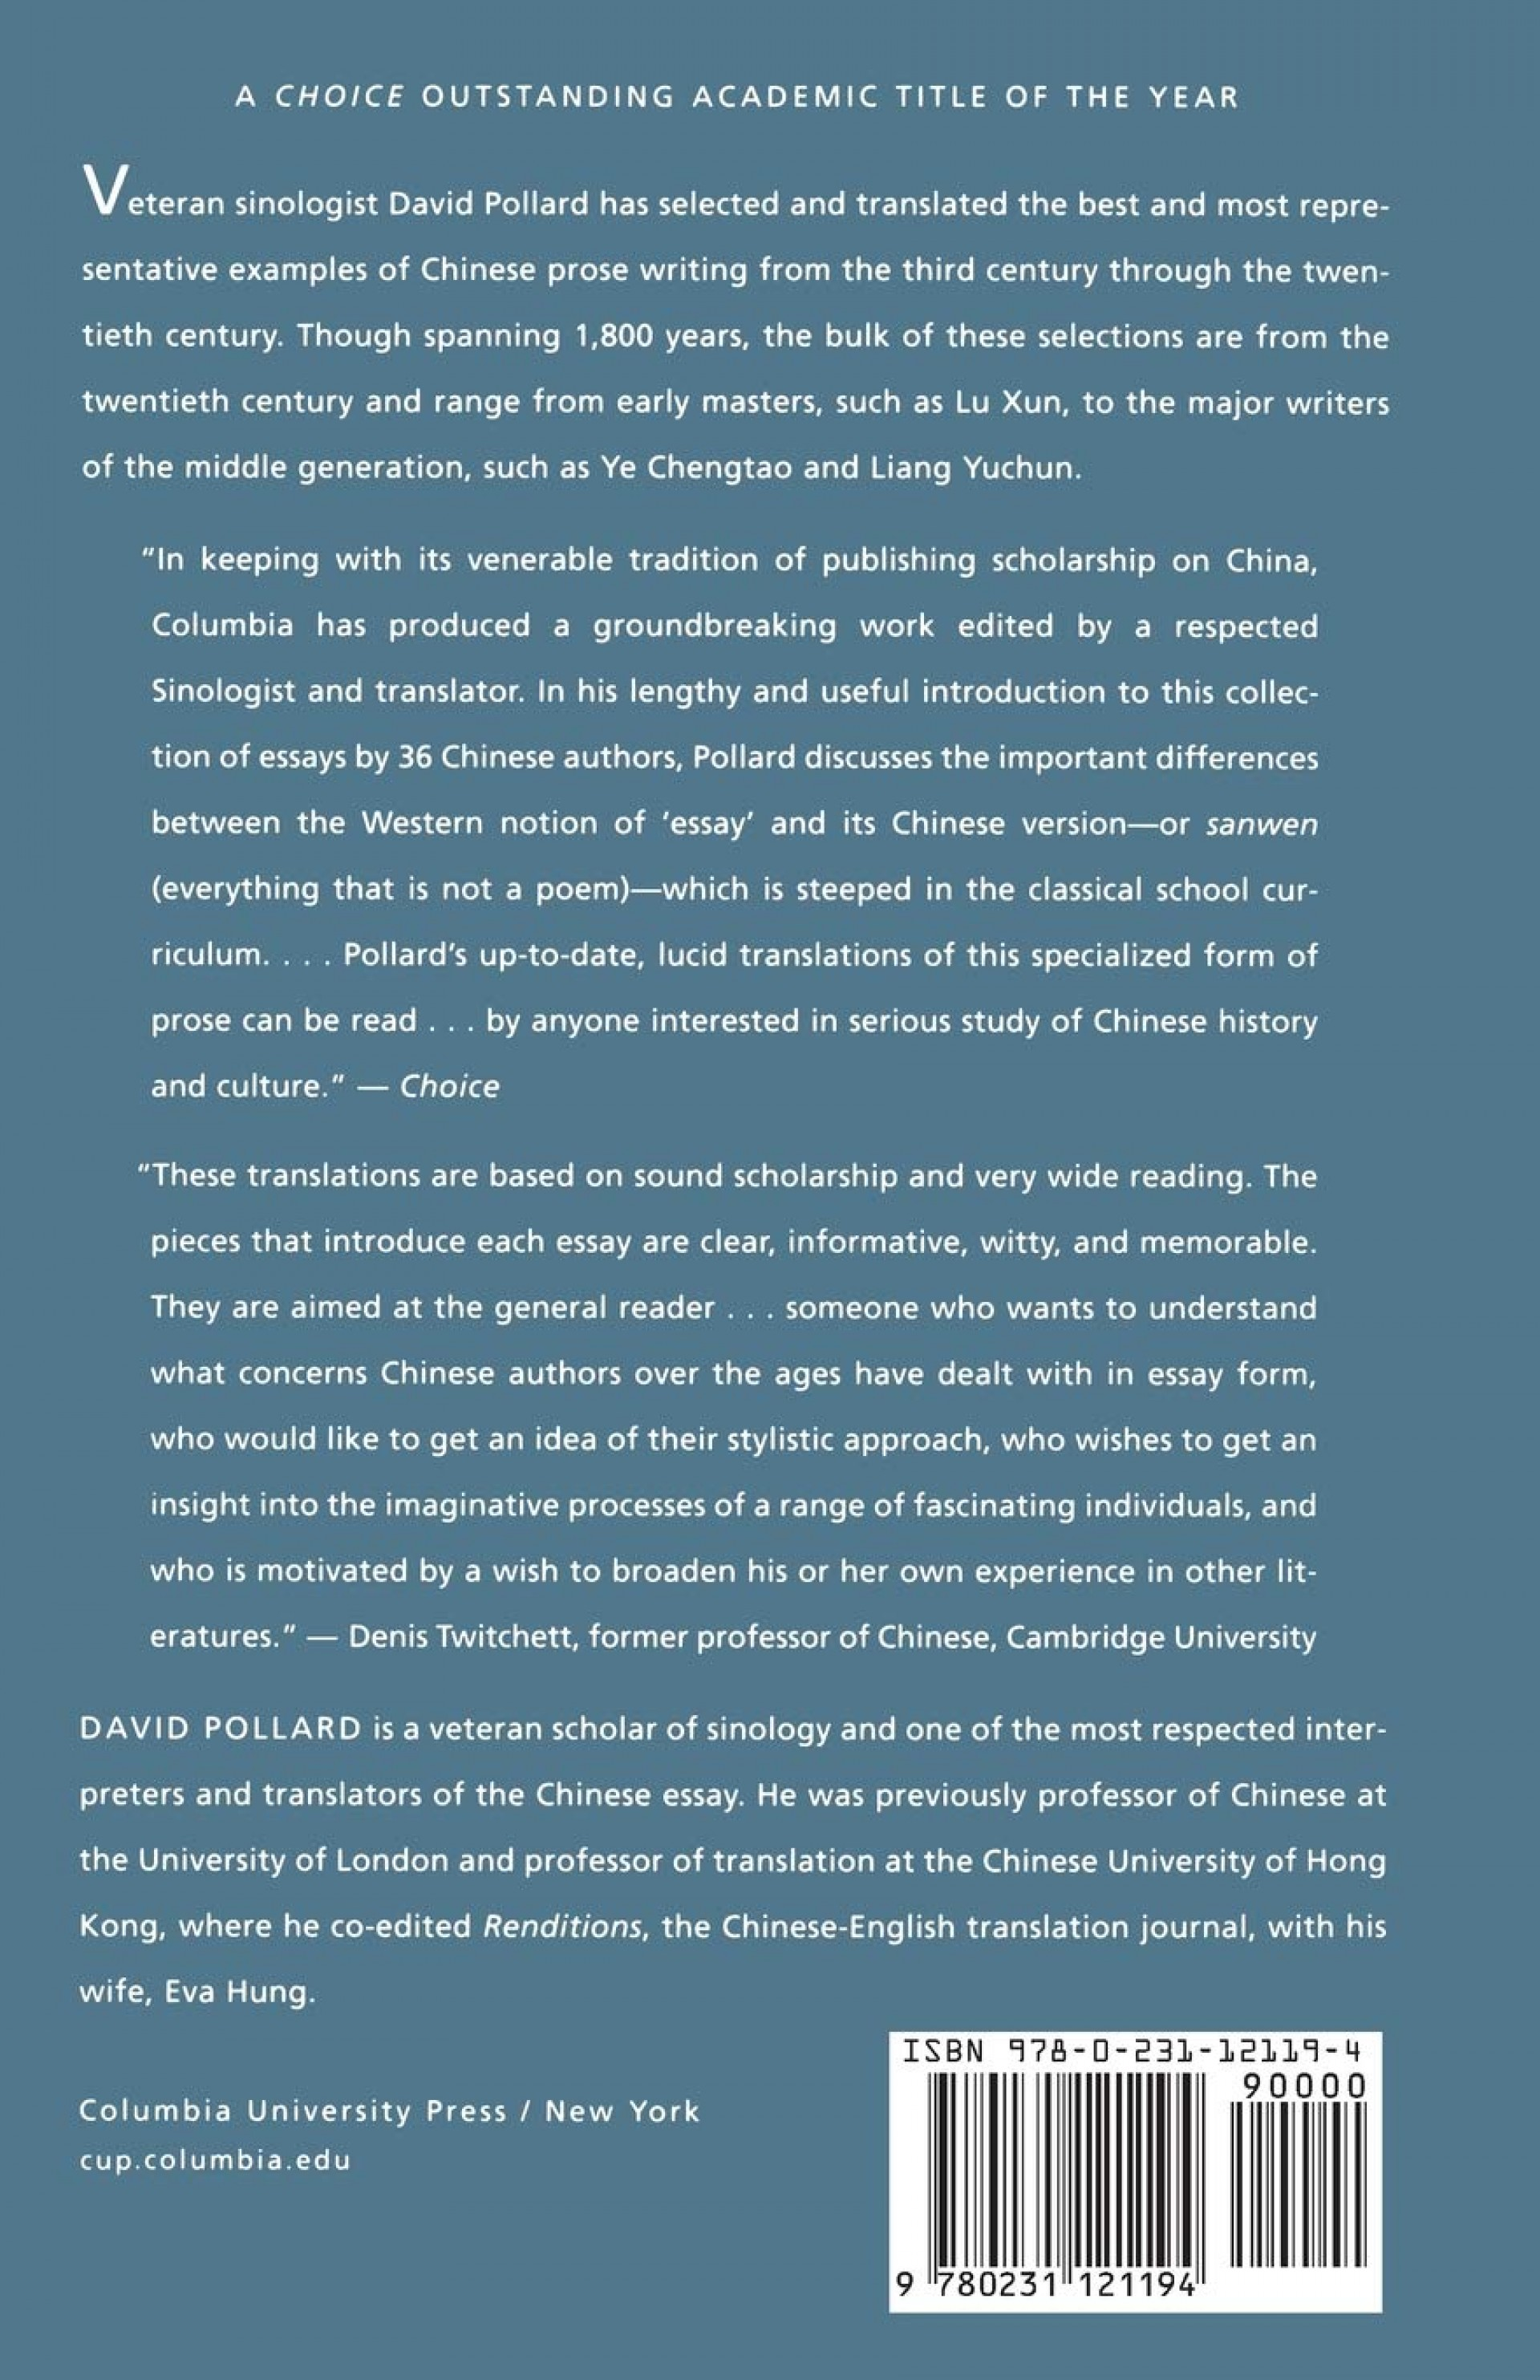 011 Essay Example Chinese Amazing Art Topics Vce Formats Sheet 1920